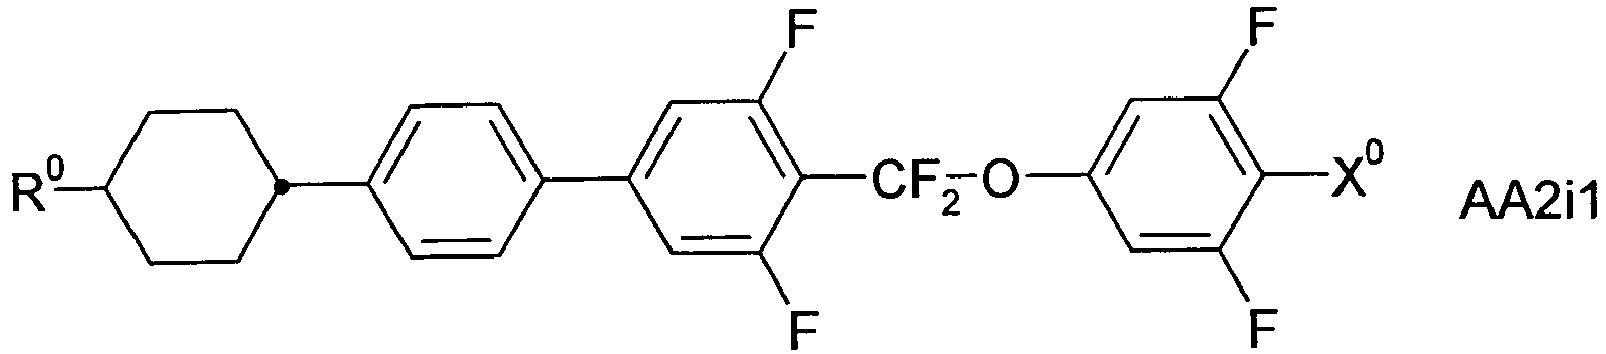 Figure imgb0508